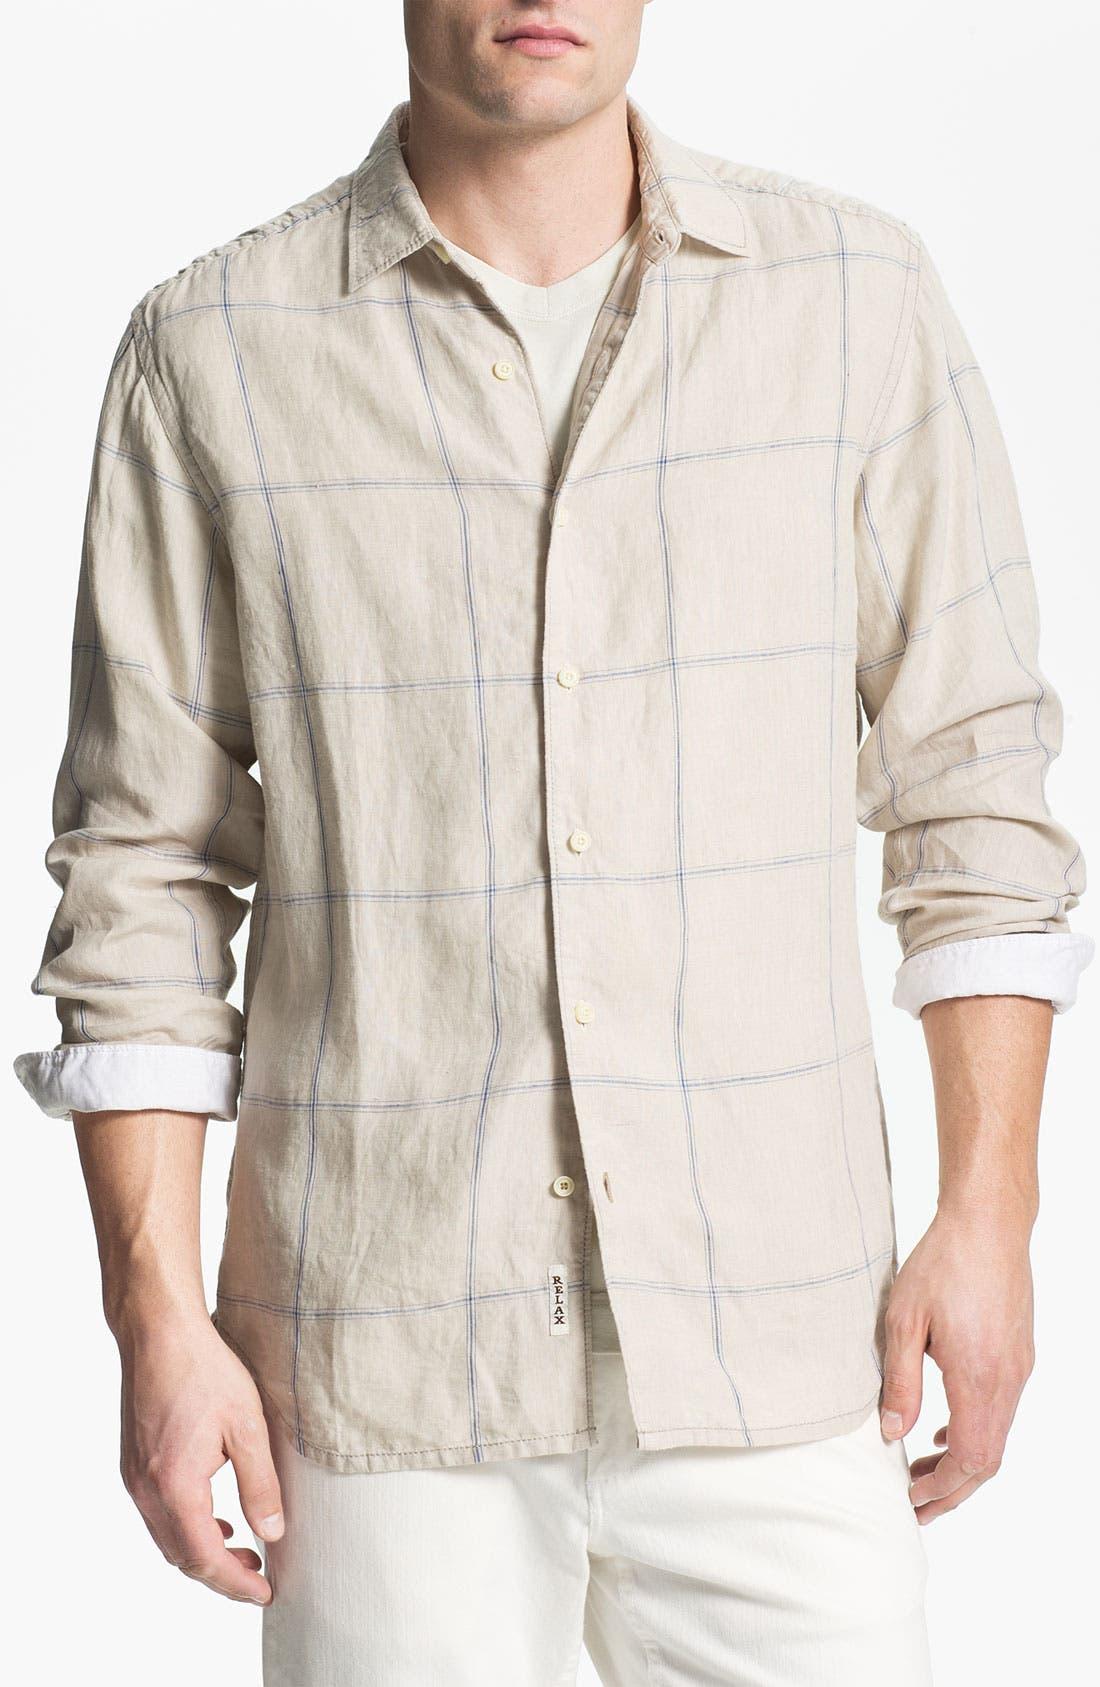 Alternate Image 1 Selected - Tommy Bahama 'Manhattan Island Breezer' Sport Shirt